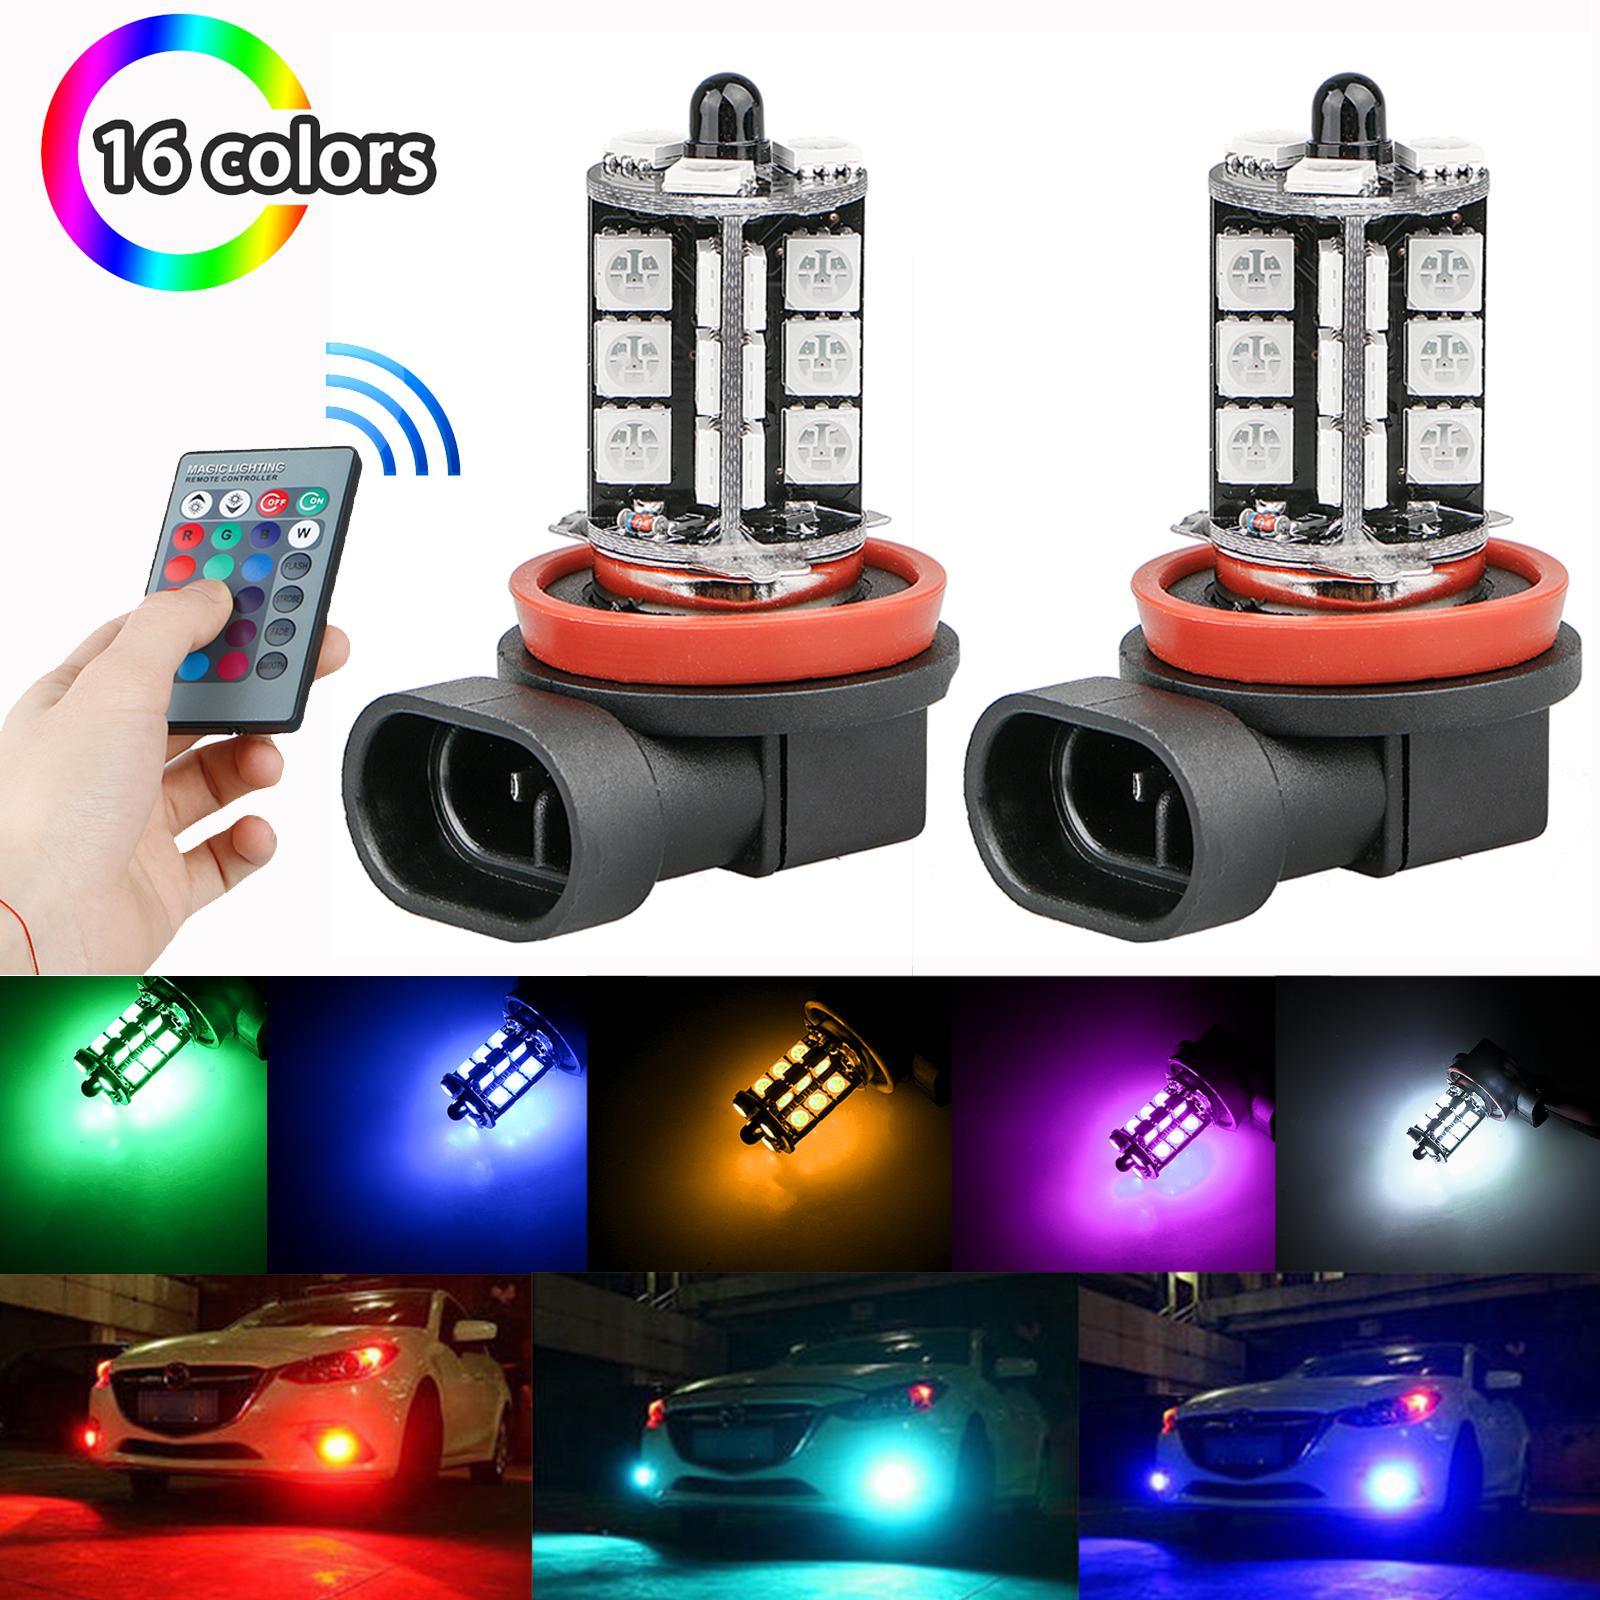 2Pcs H8/H9/H11 27SMD 5050 Multi-Color RGB LED Fog Lights Driving Bulbs + Remote